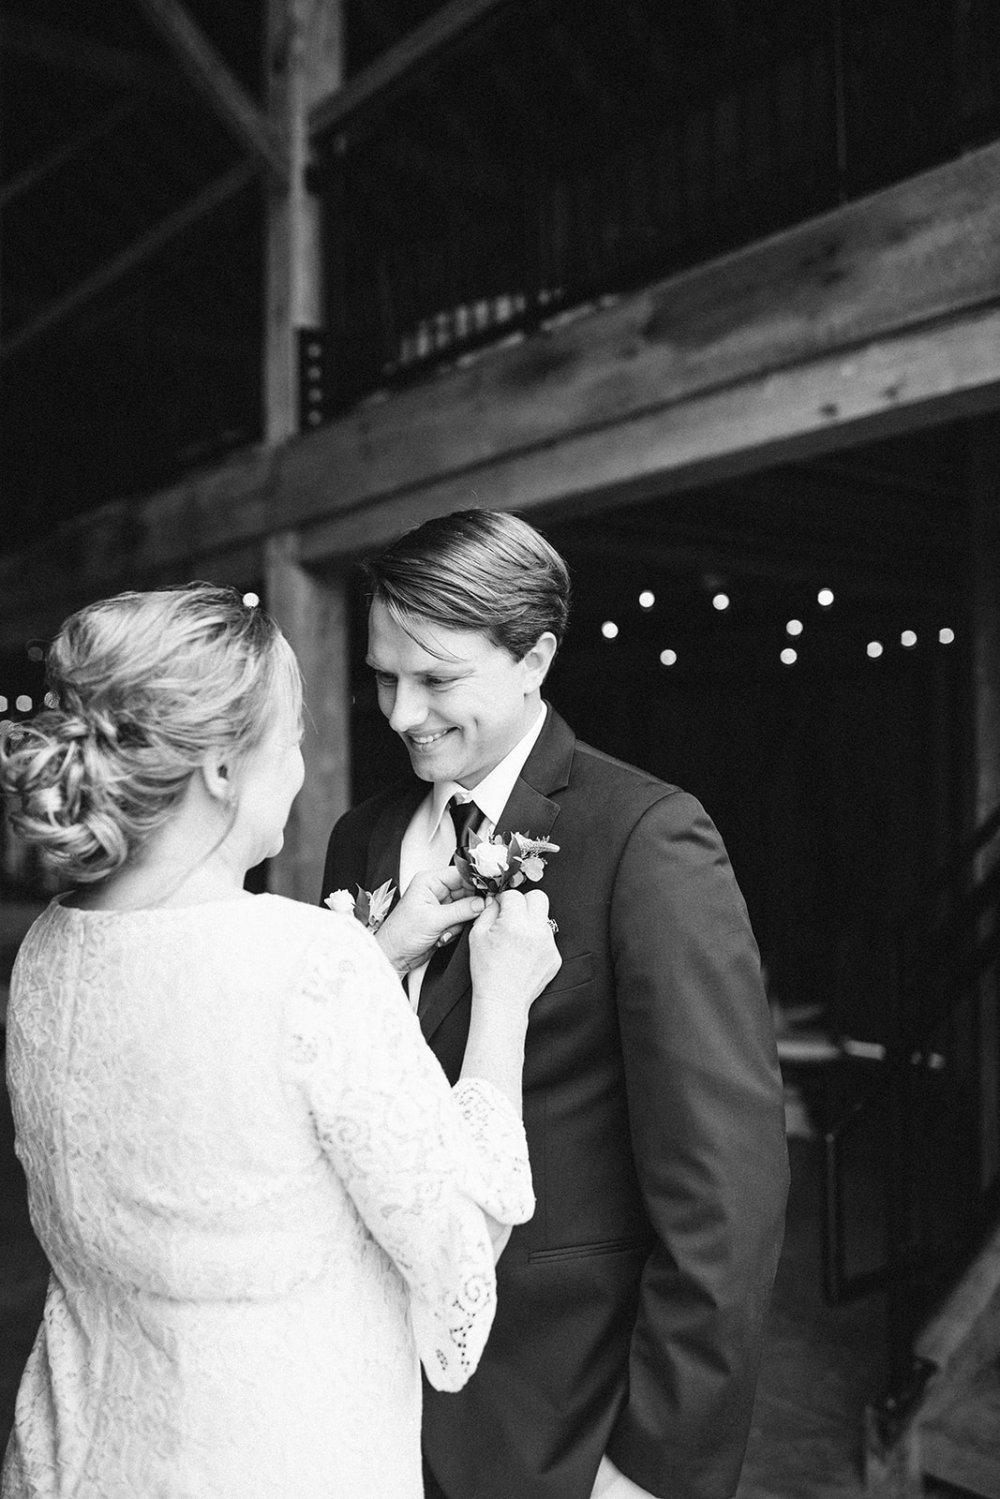 Calan-Adam-WEDDING-JUNE-2019-116 3.jpg